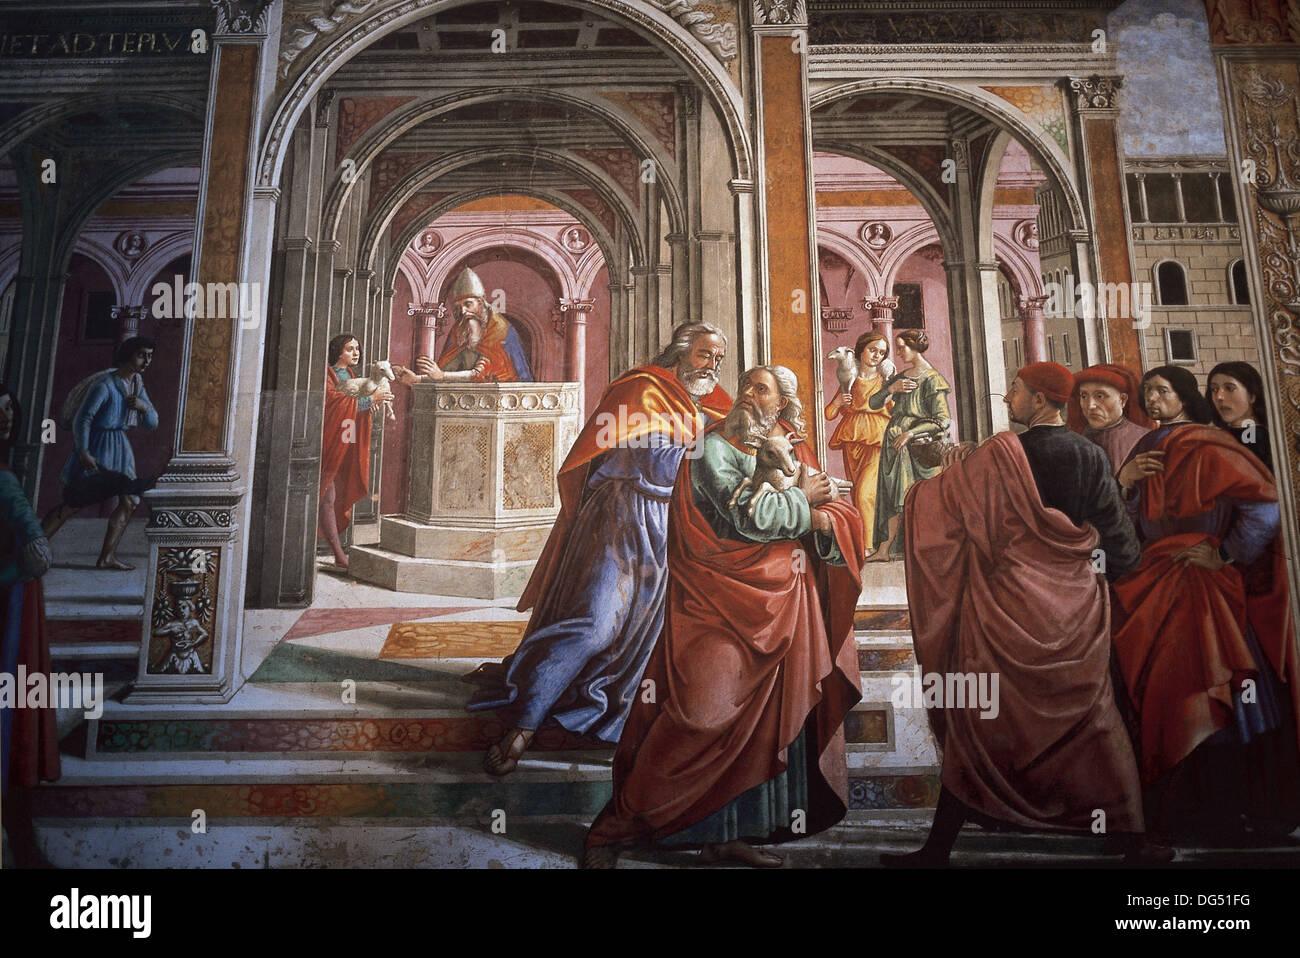 Domenico Ghirlandaio (1449 –1494). The Expulsion of Joachim from the Temple. Tornabuoni Chapel. Santa Maria Novella. Florence. - Stock Image